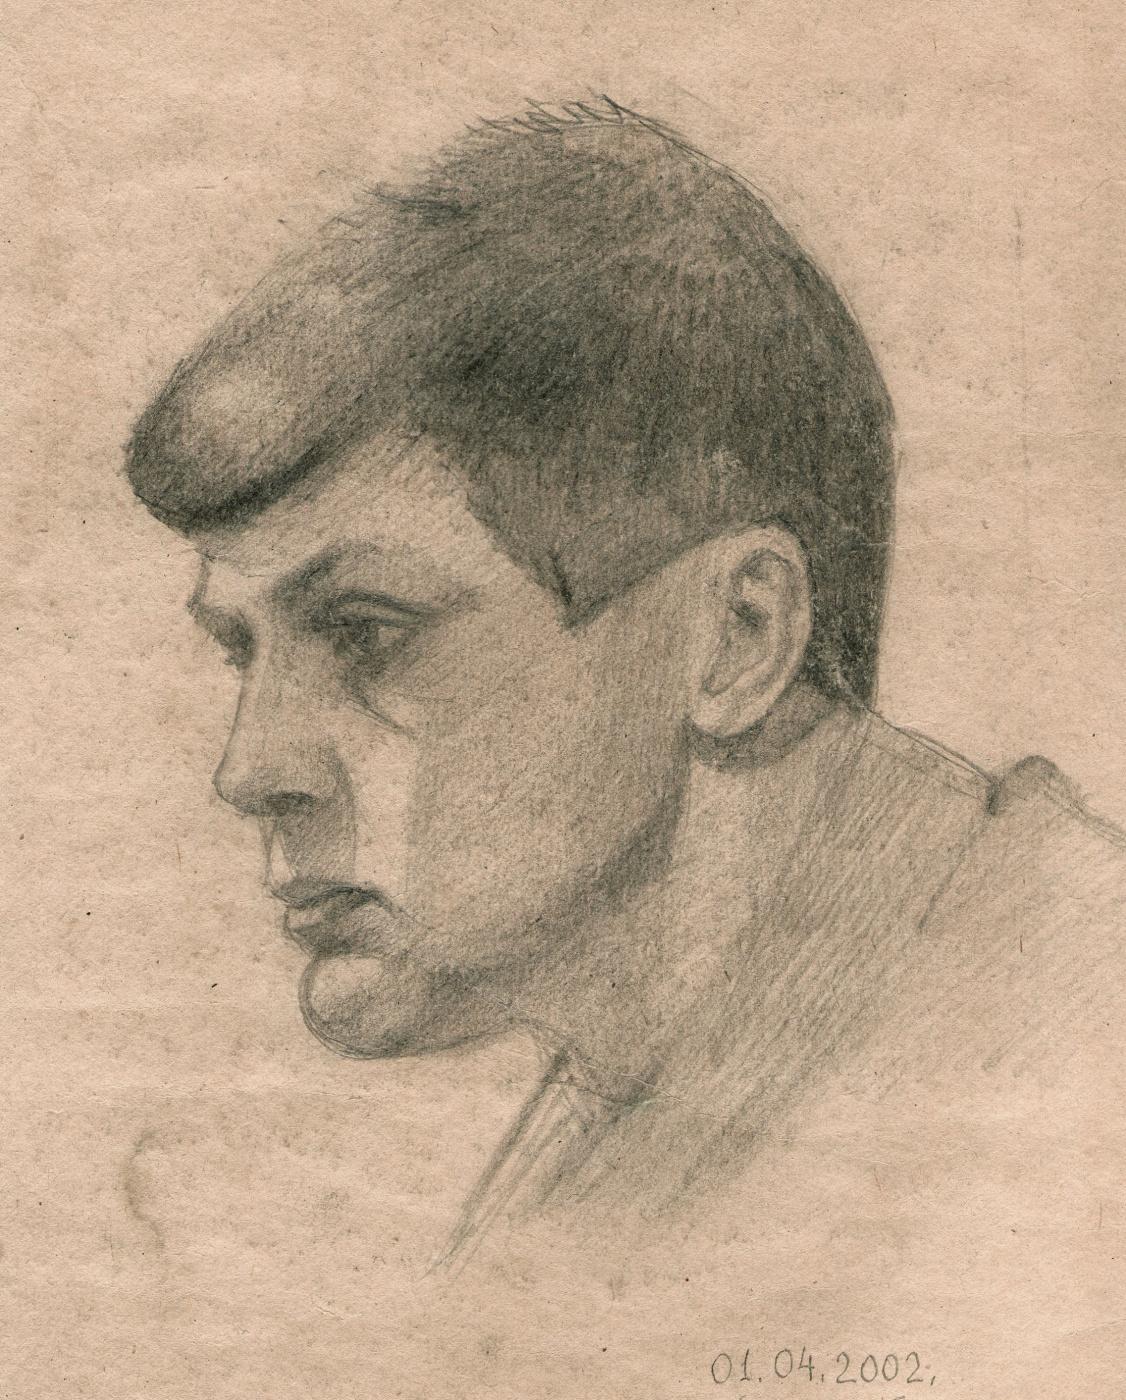 Alexey RusAC. Head Drawing